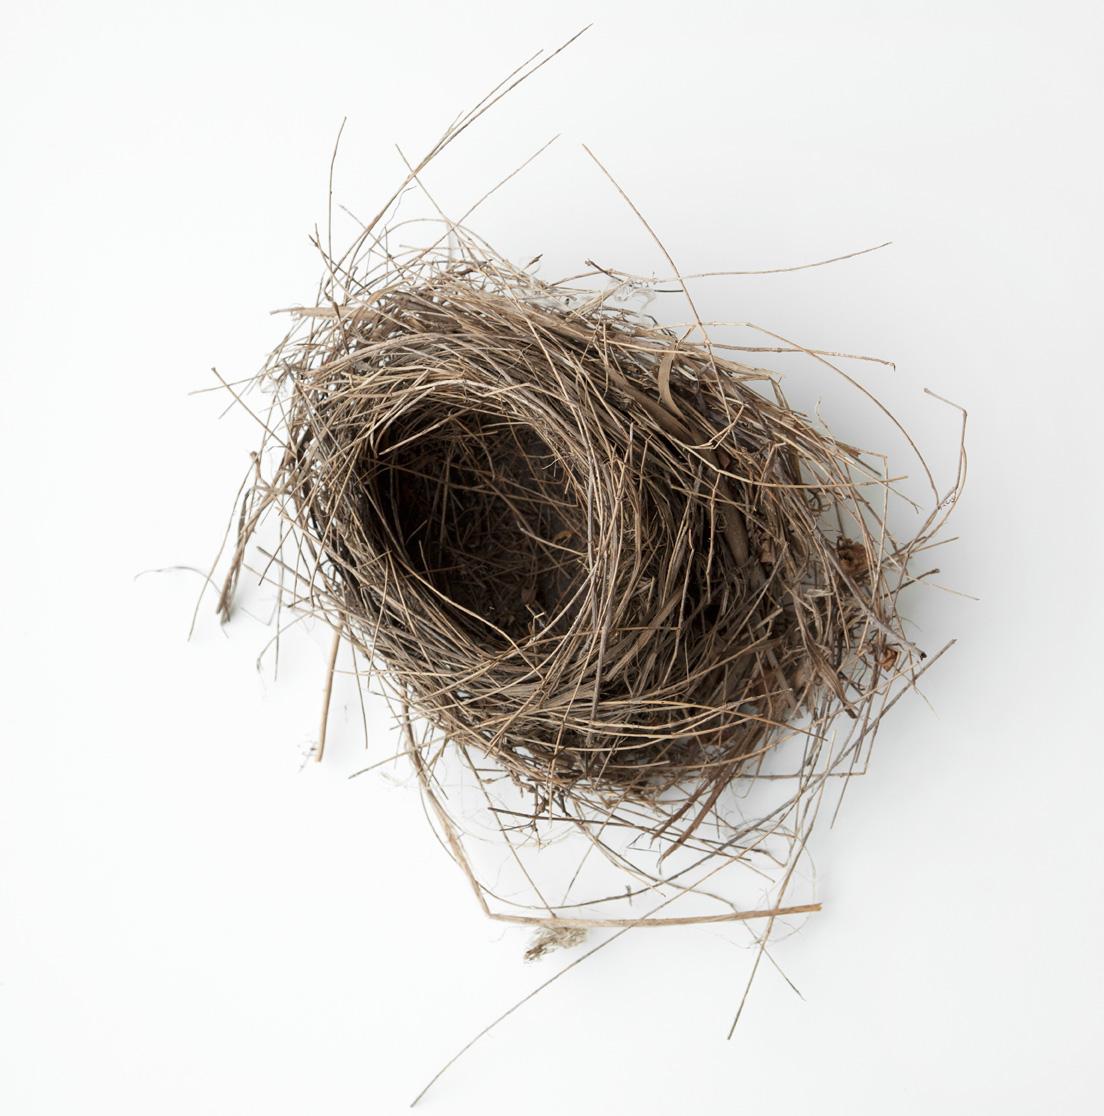 Nest-2569 copy.jpg